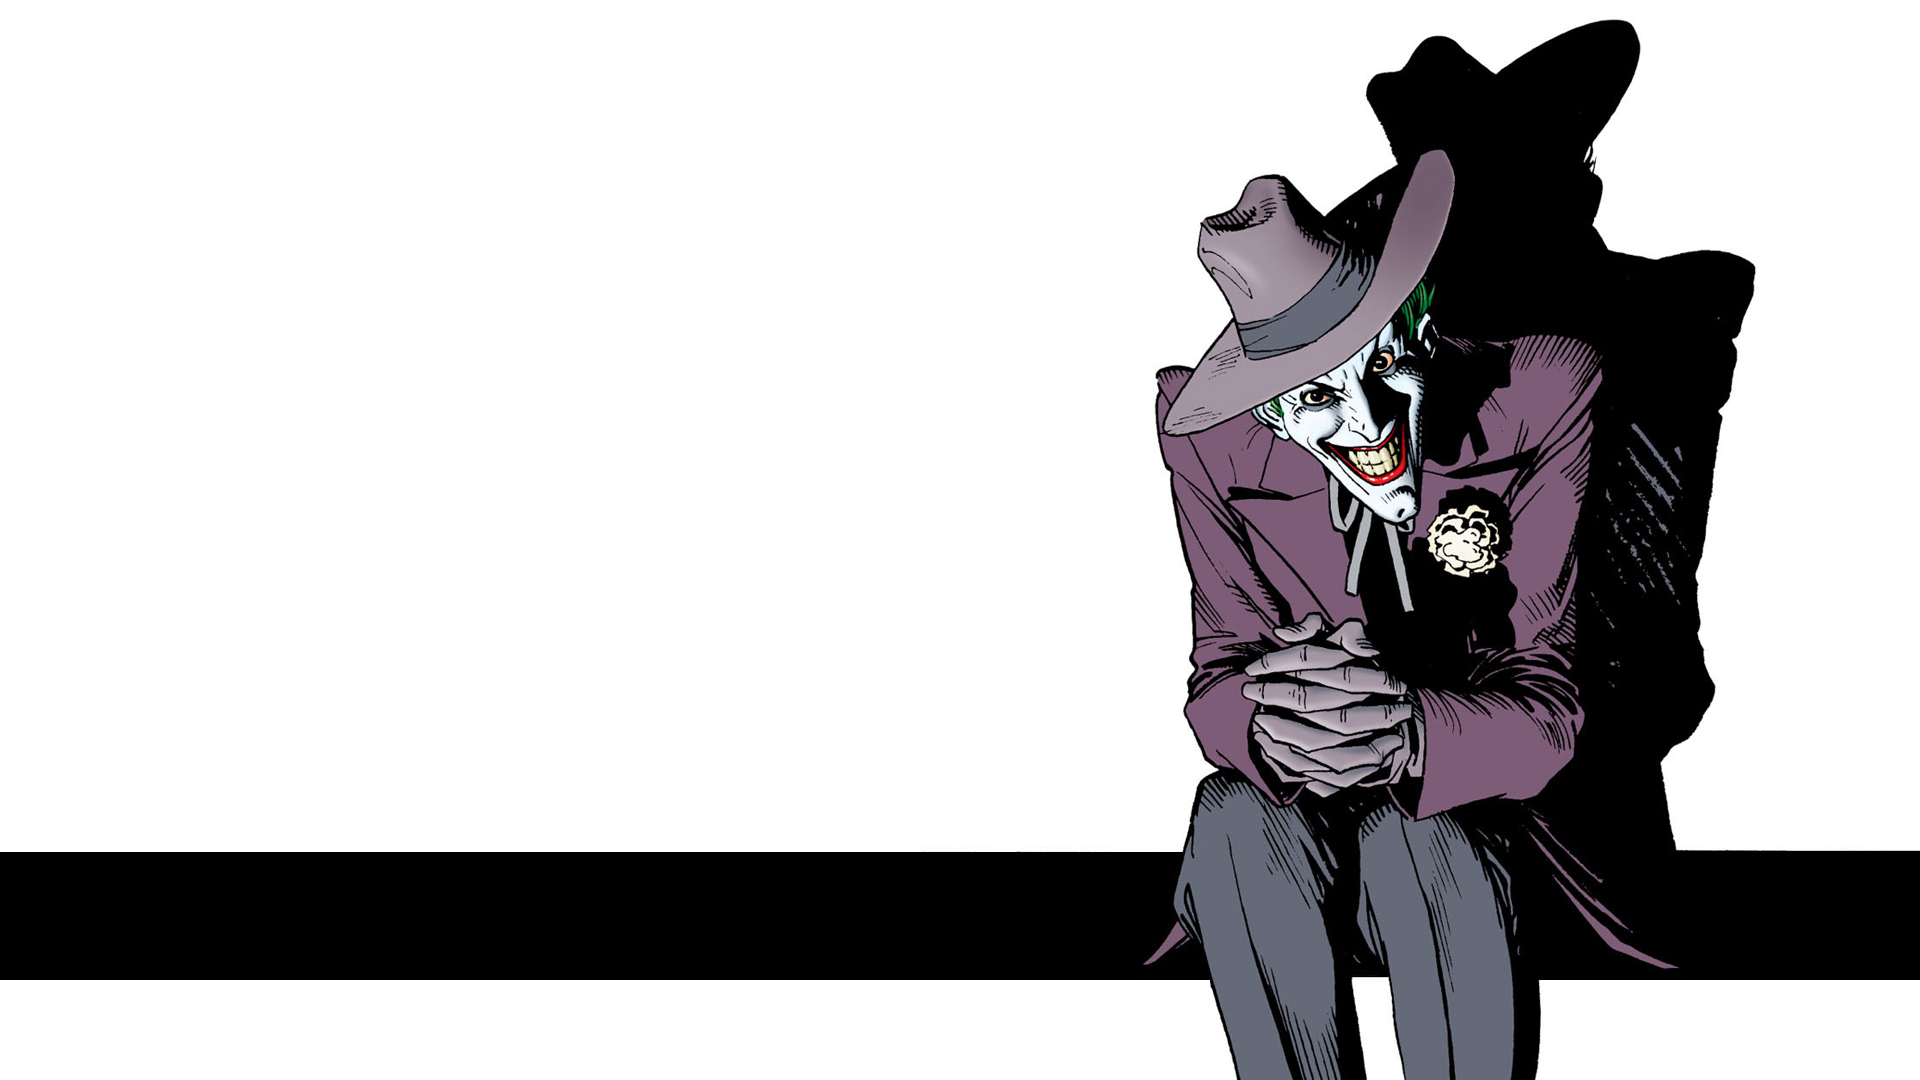 Batman Killing Joker Wallpaper - WallpaperSafari